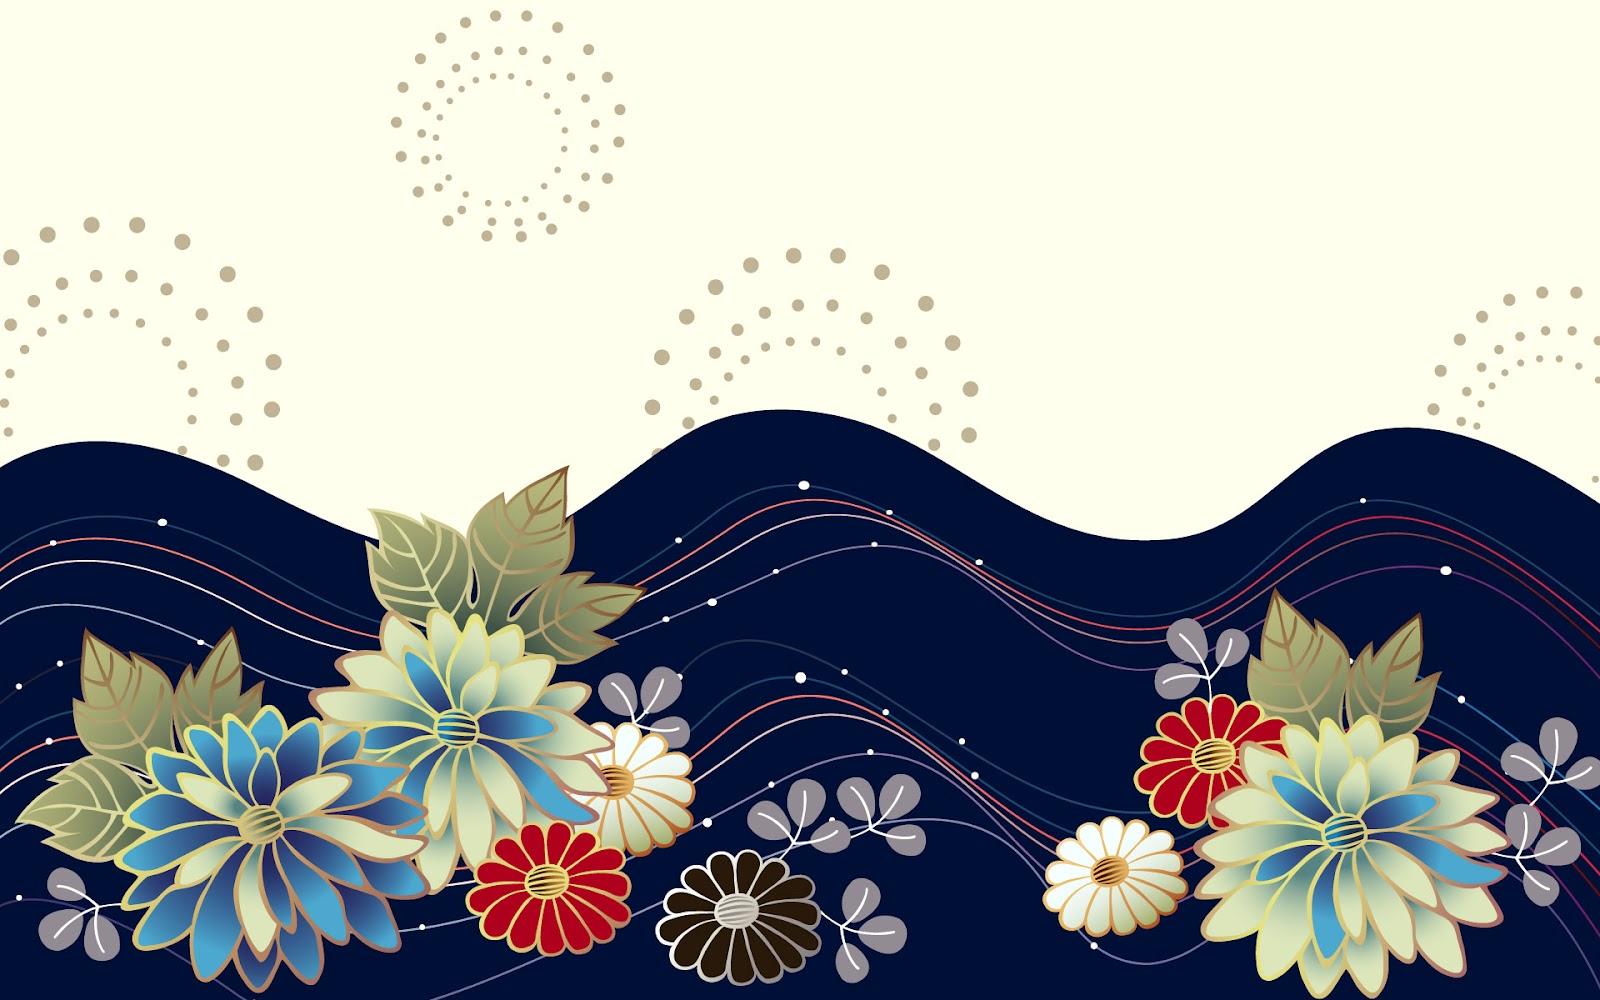 gambar corak abstrak related - photo #30